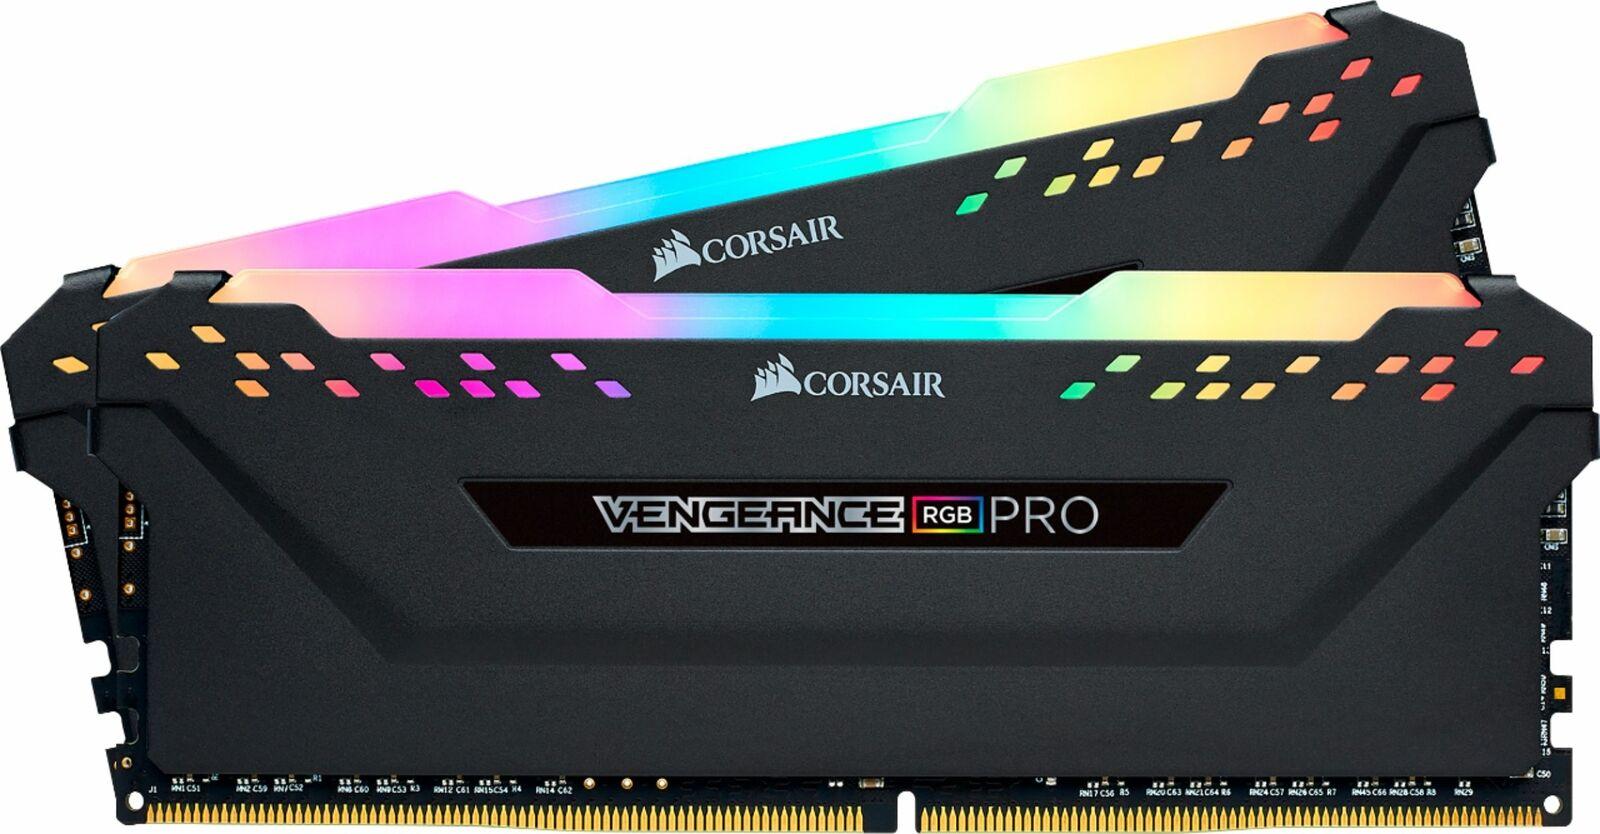 CORSAIR - VENGEANCE RGB PRO 32GB (2x16GB) DDR4 3600 (PC4-28800) C18 Desktop M.... Buy it now for 172.99